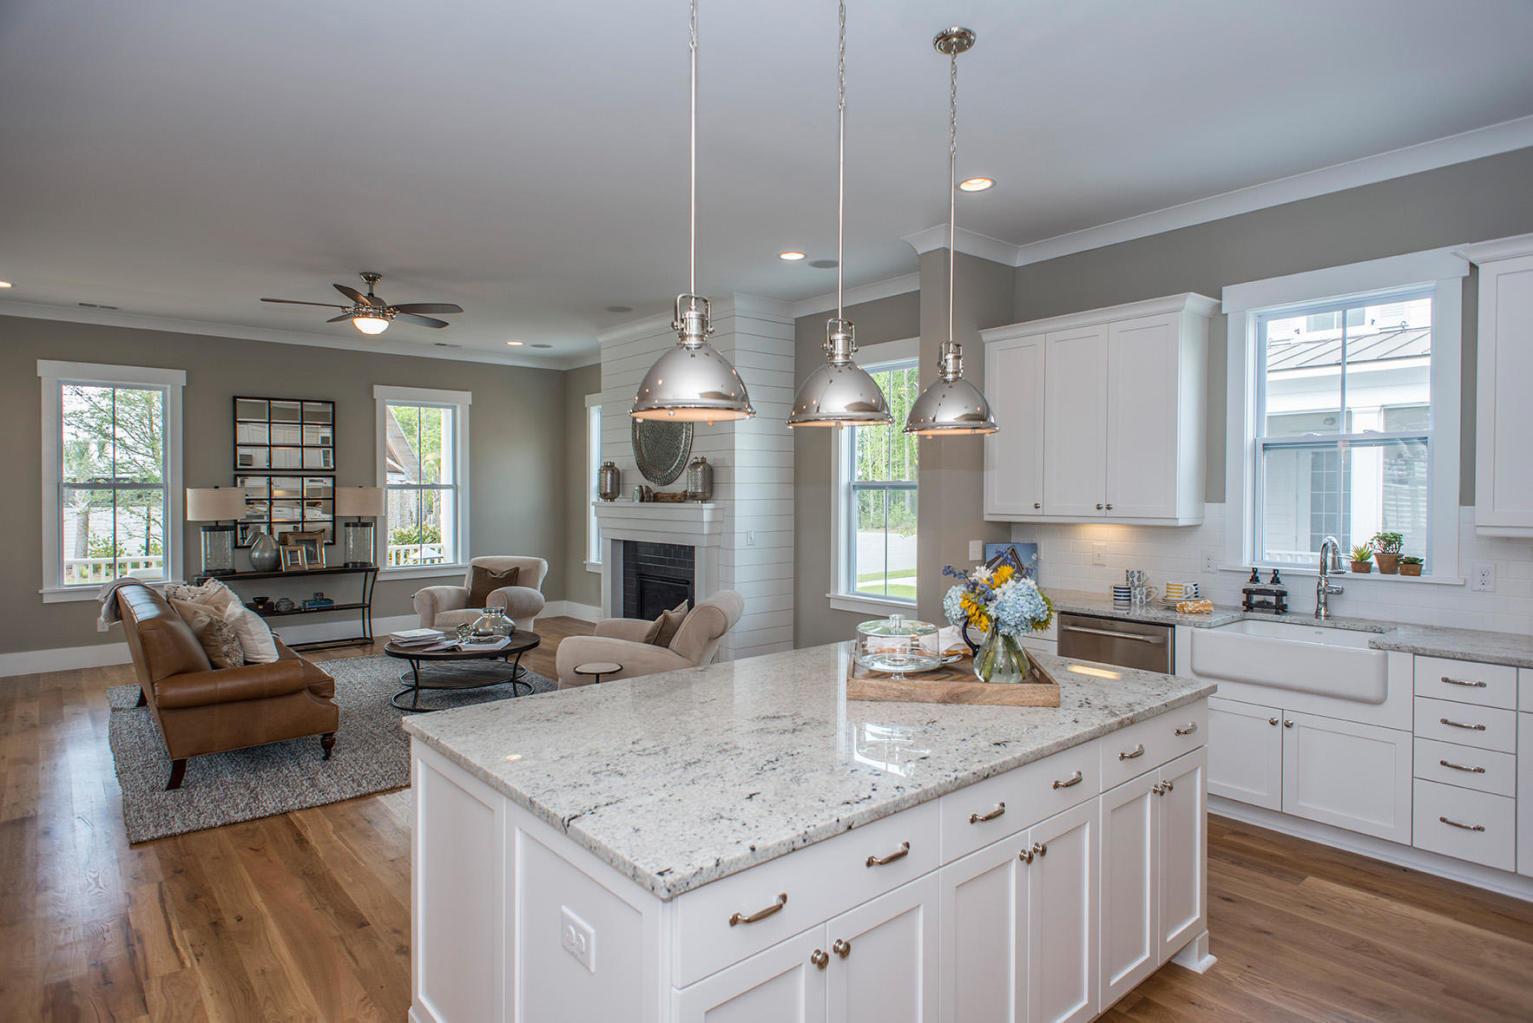 Carolina Park Homes For Sale - 1534 Banning, Mount Pleasant, SC - 18